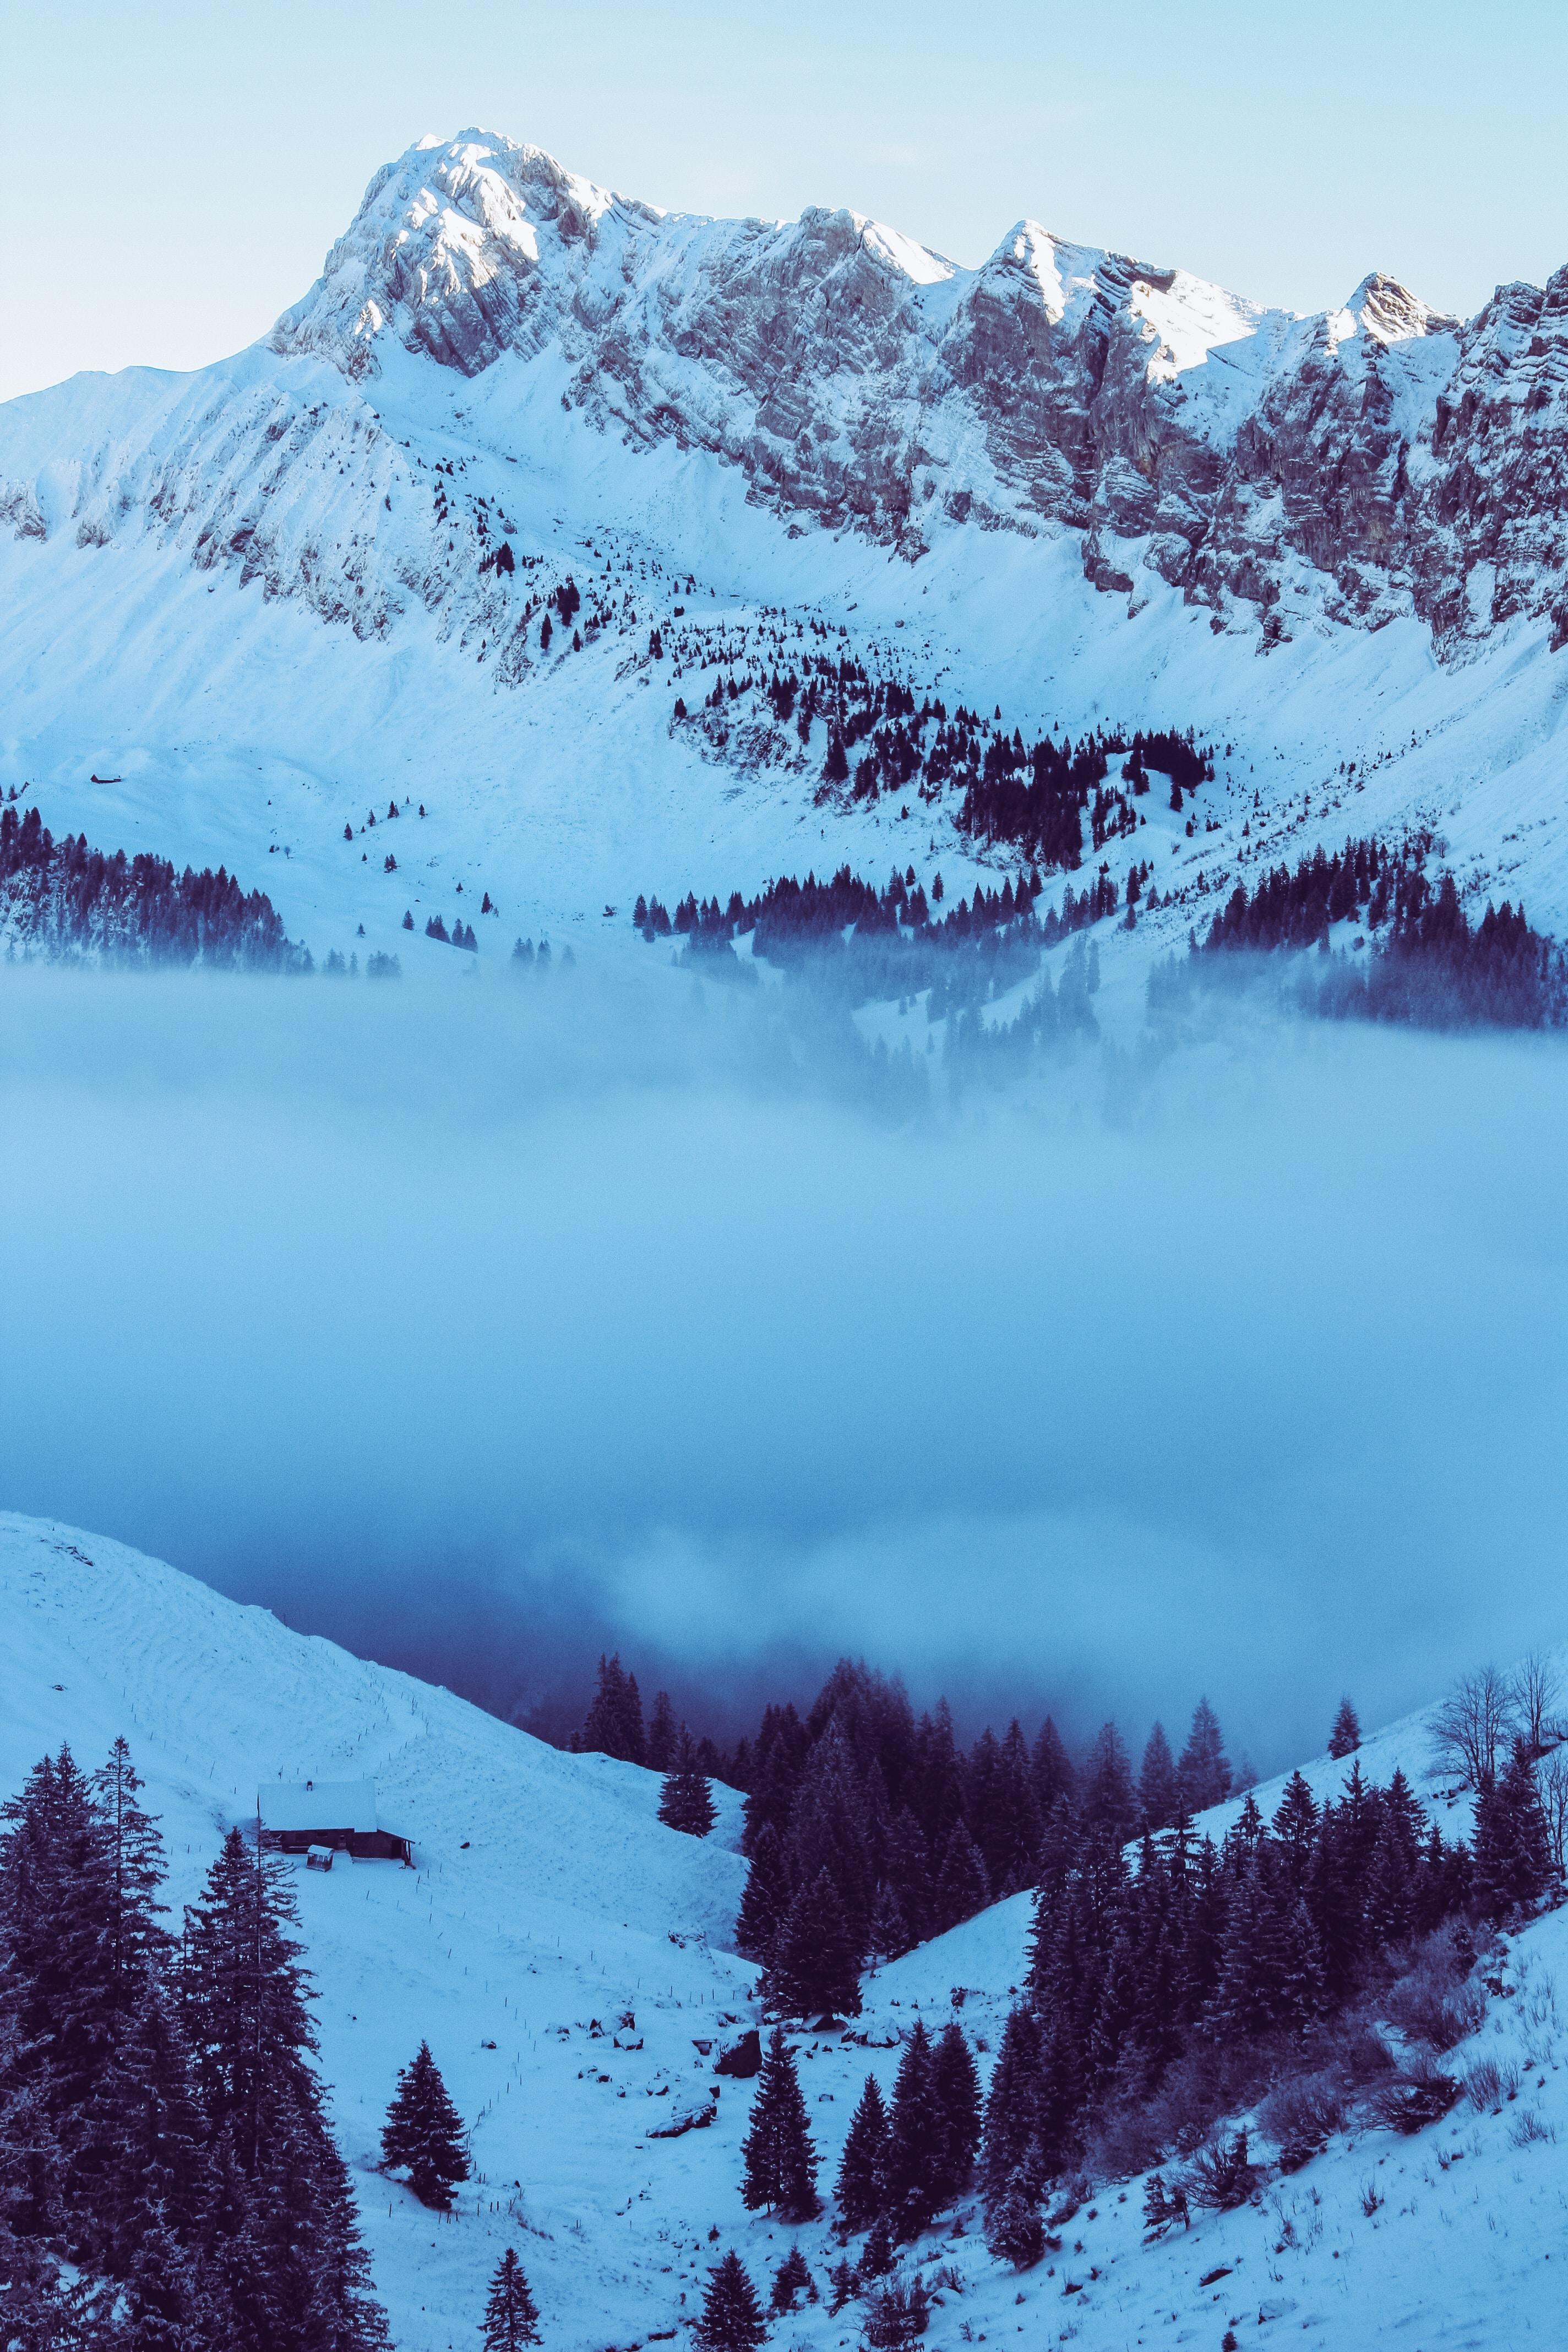 snow-cape mountain